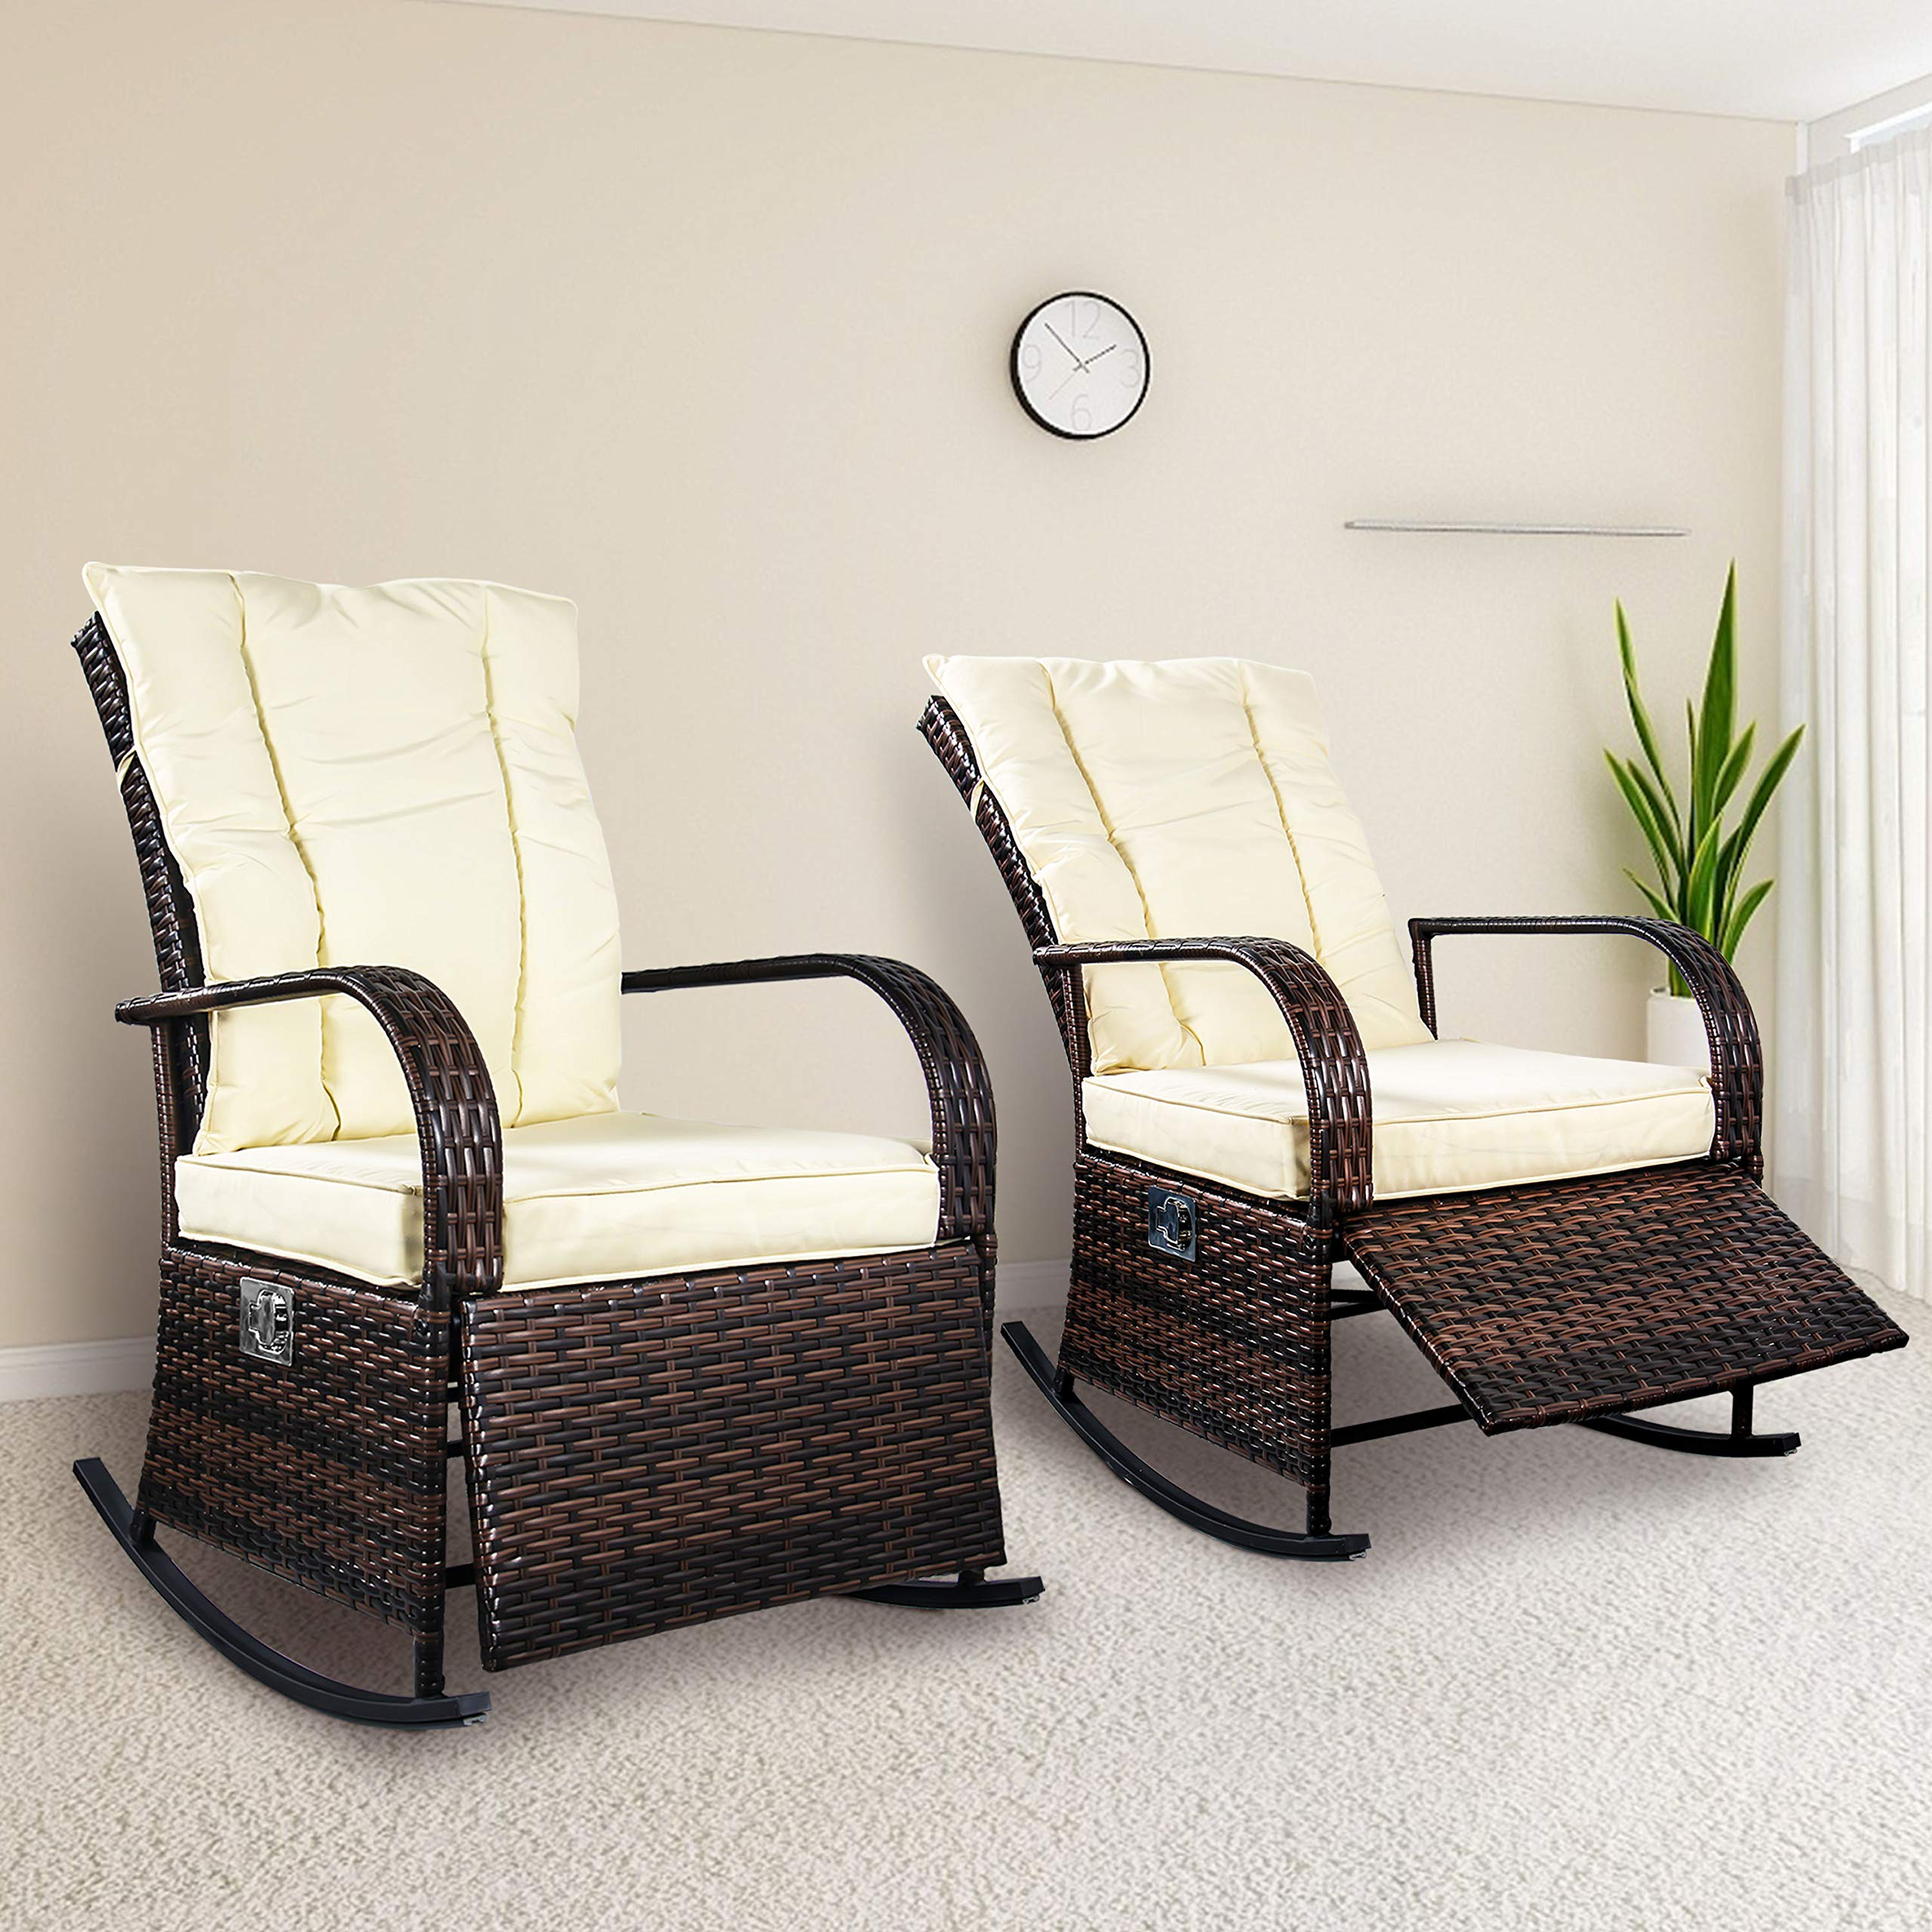 Set of 2 Indoor & Outdoor PE Wicker Rocking Chair Porch Garden Lawn Deck Auto Adjustable Rattan Reclining chiar Patio Furniture w/Water-Proof Cushion